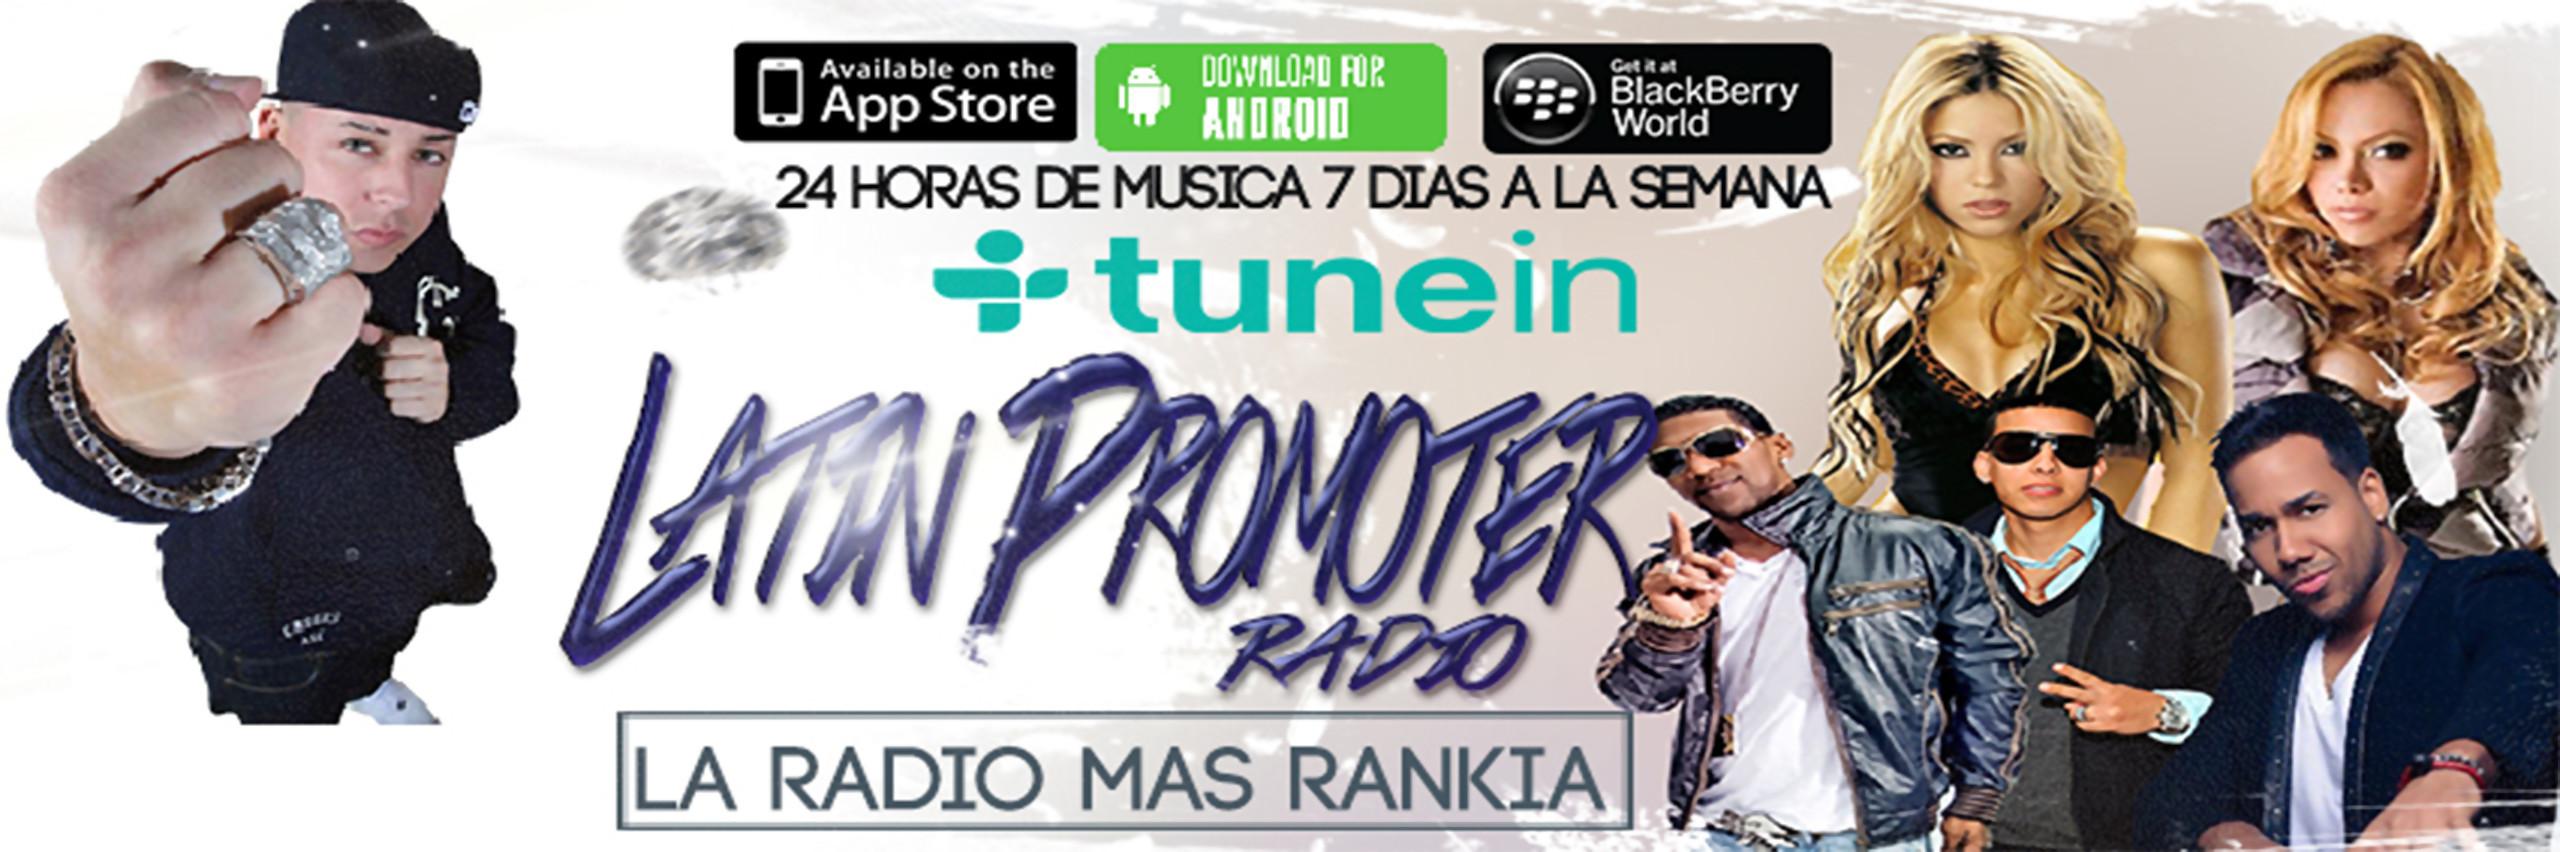 latin promoter